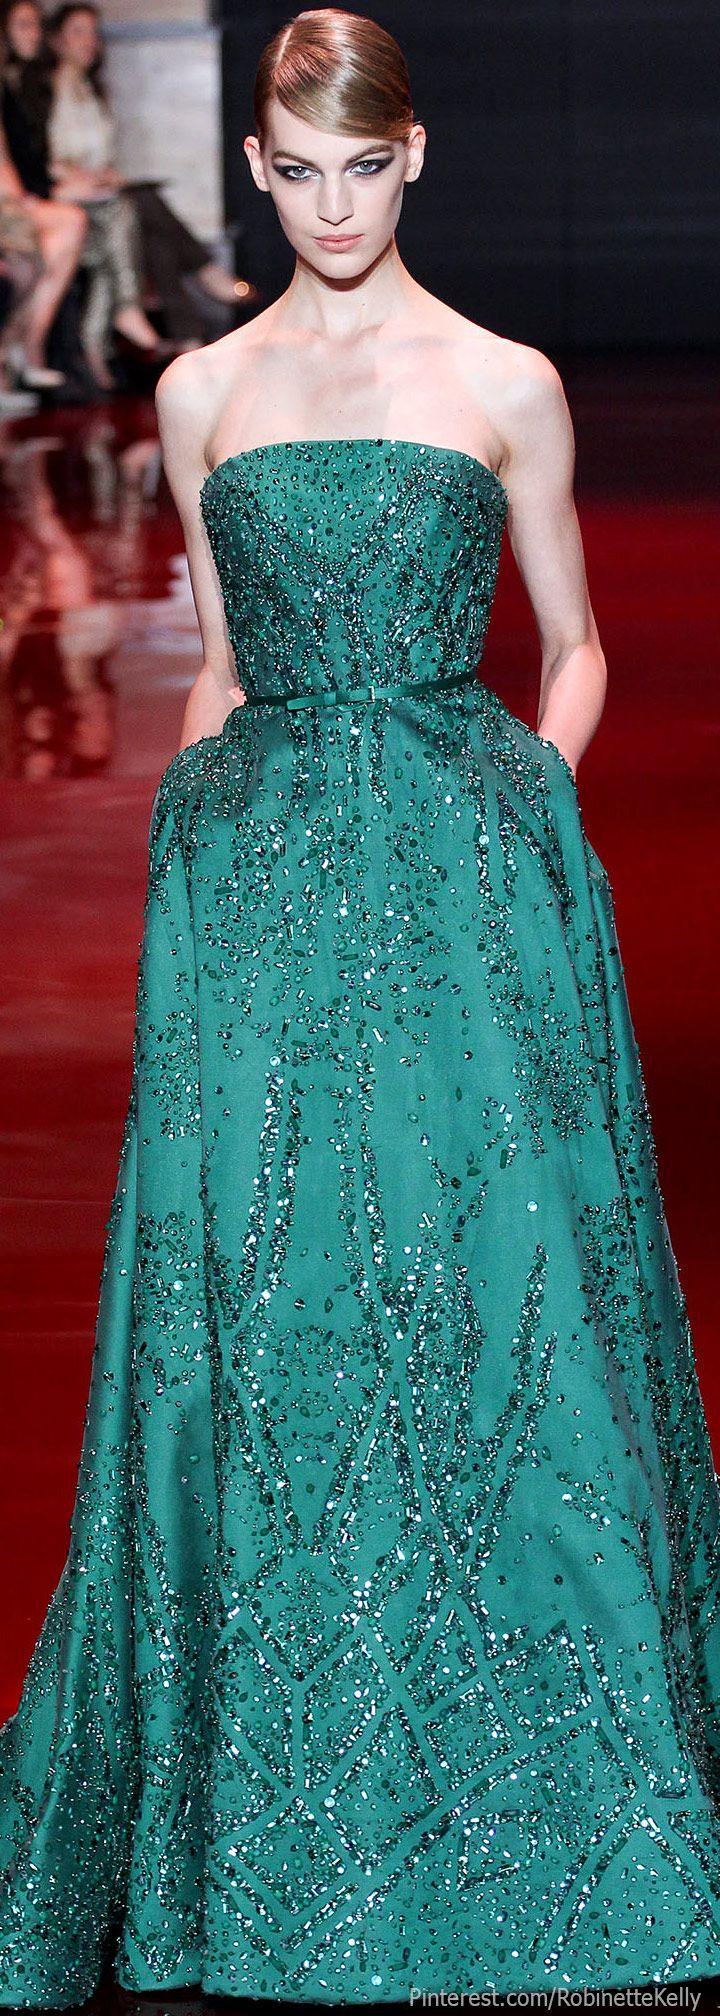 252 best Elie Saab ❤ images on Pinterest | High fashion, Dream ...